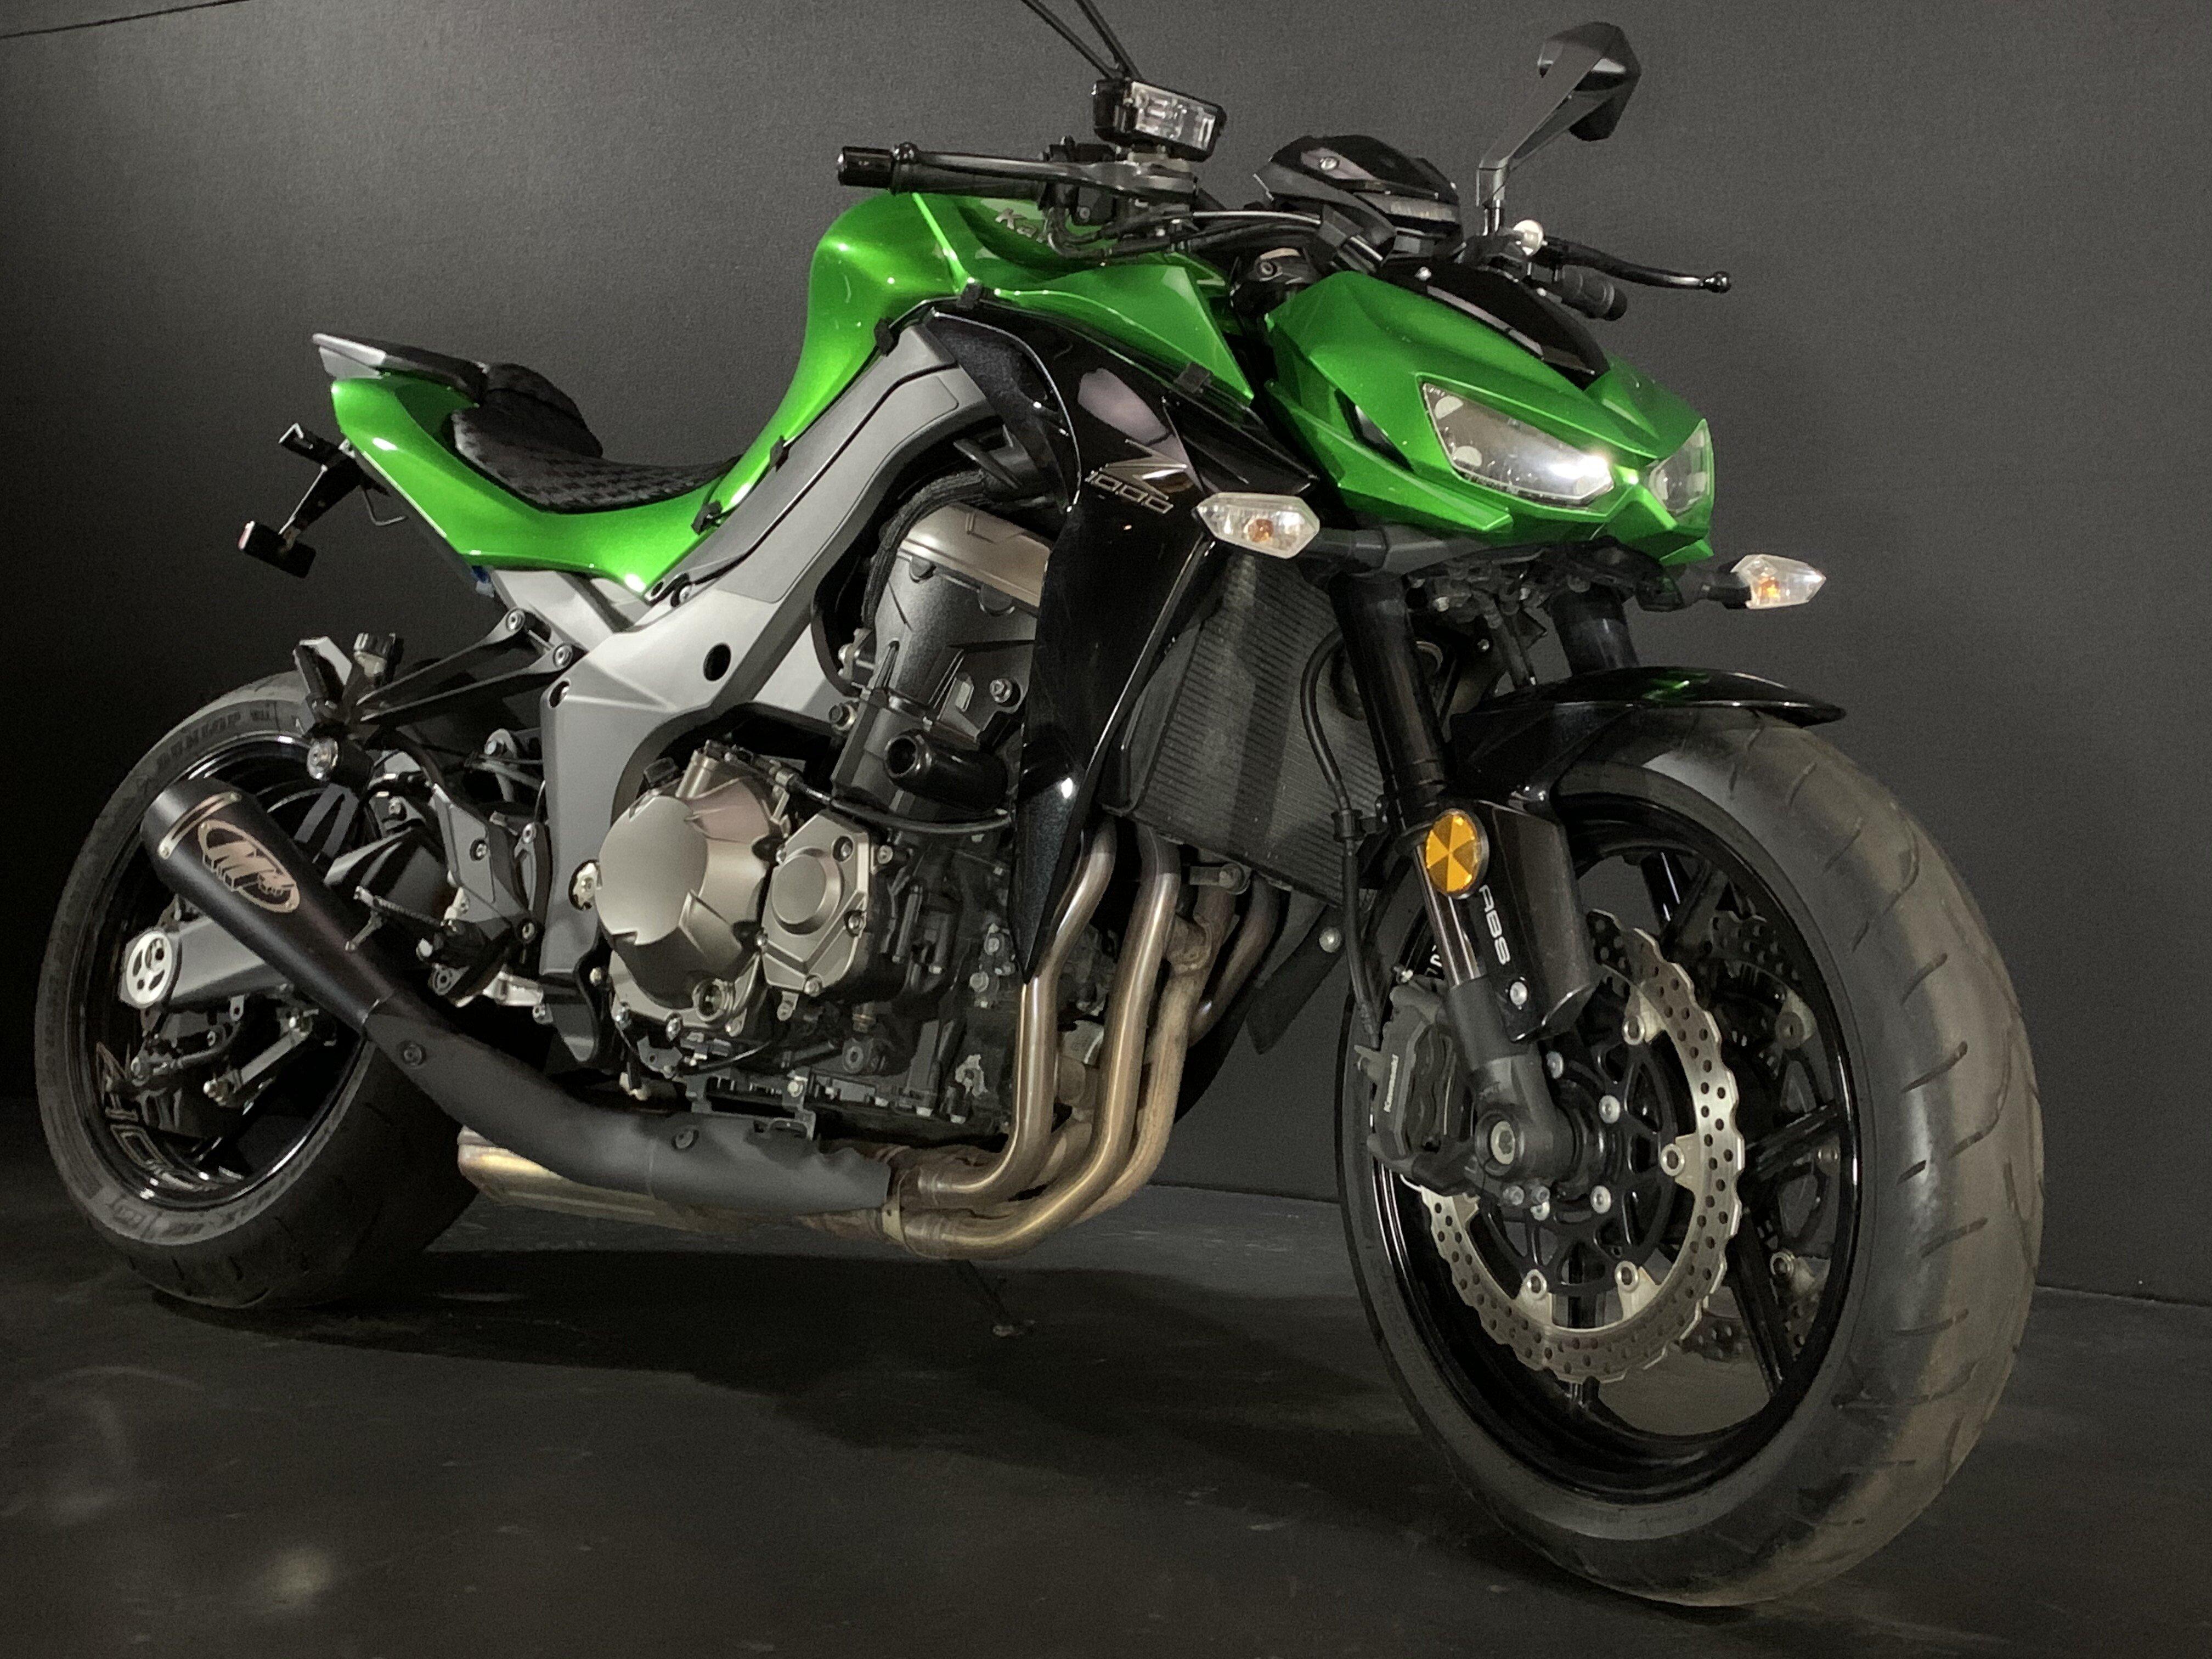 Kawasaki Z1000 motorcycles for sale on Auto Trader Bikes